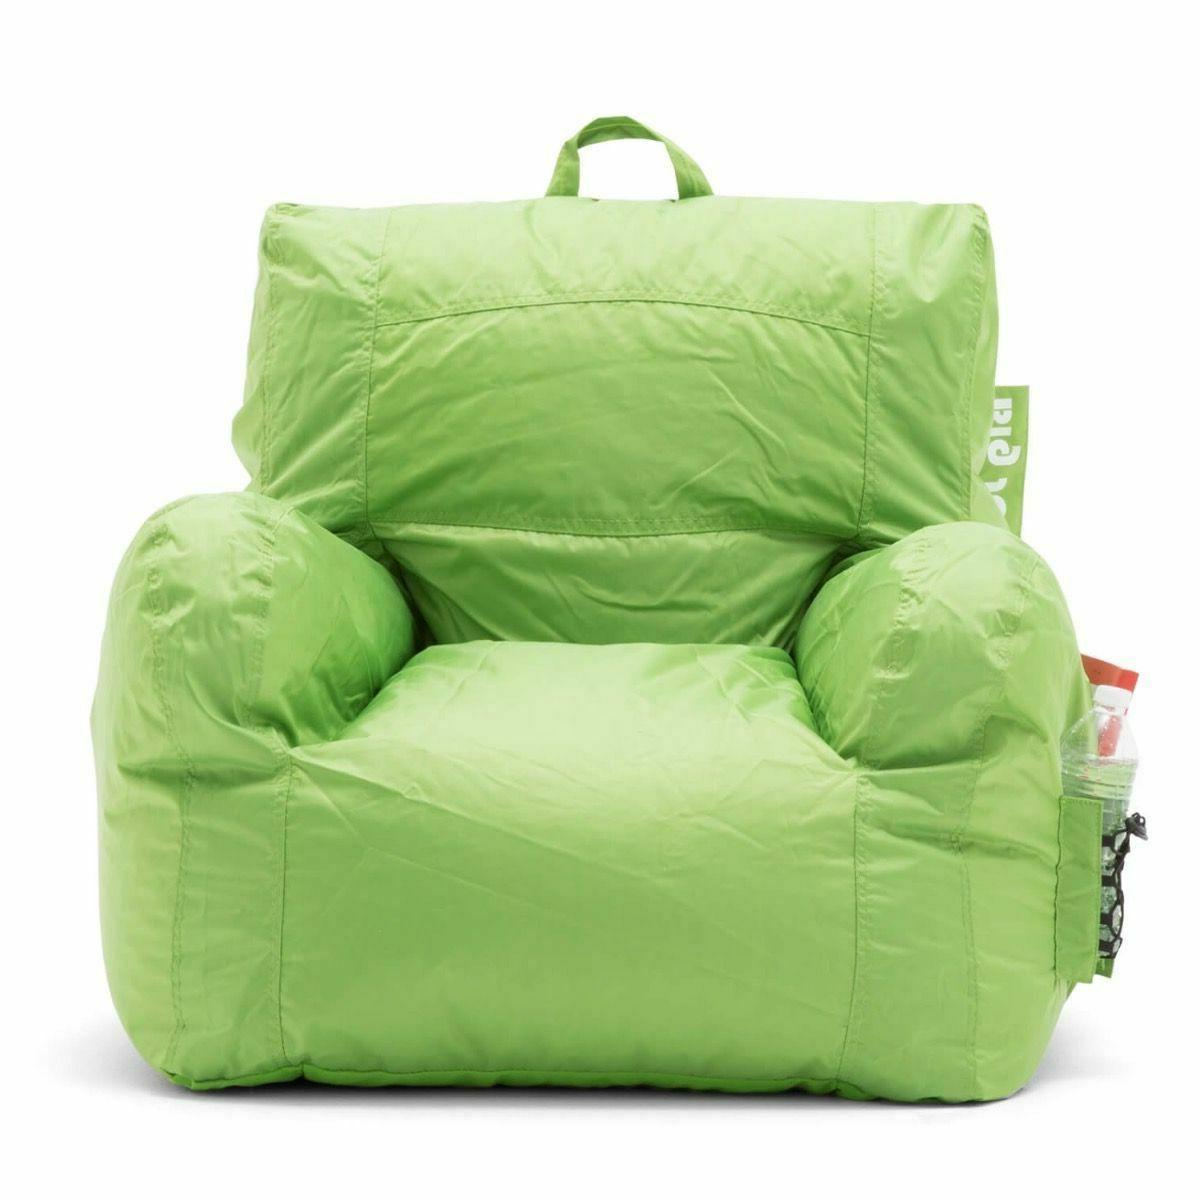 Chair Waterproof Sofa Teens Adults